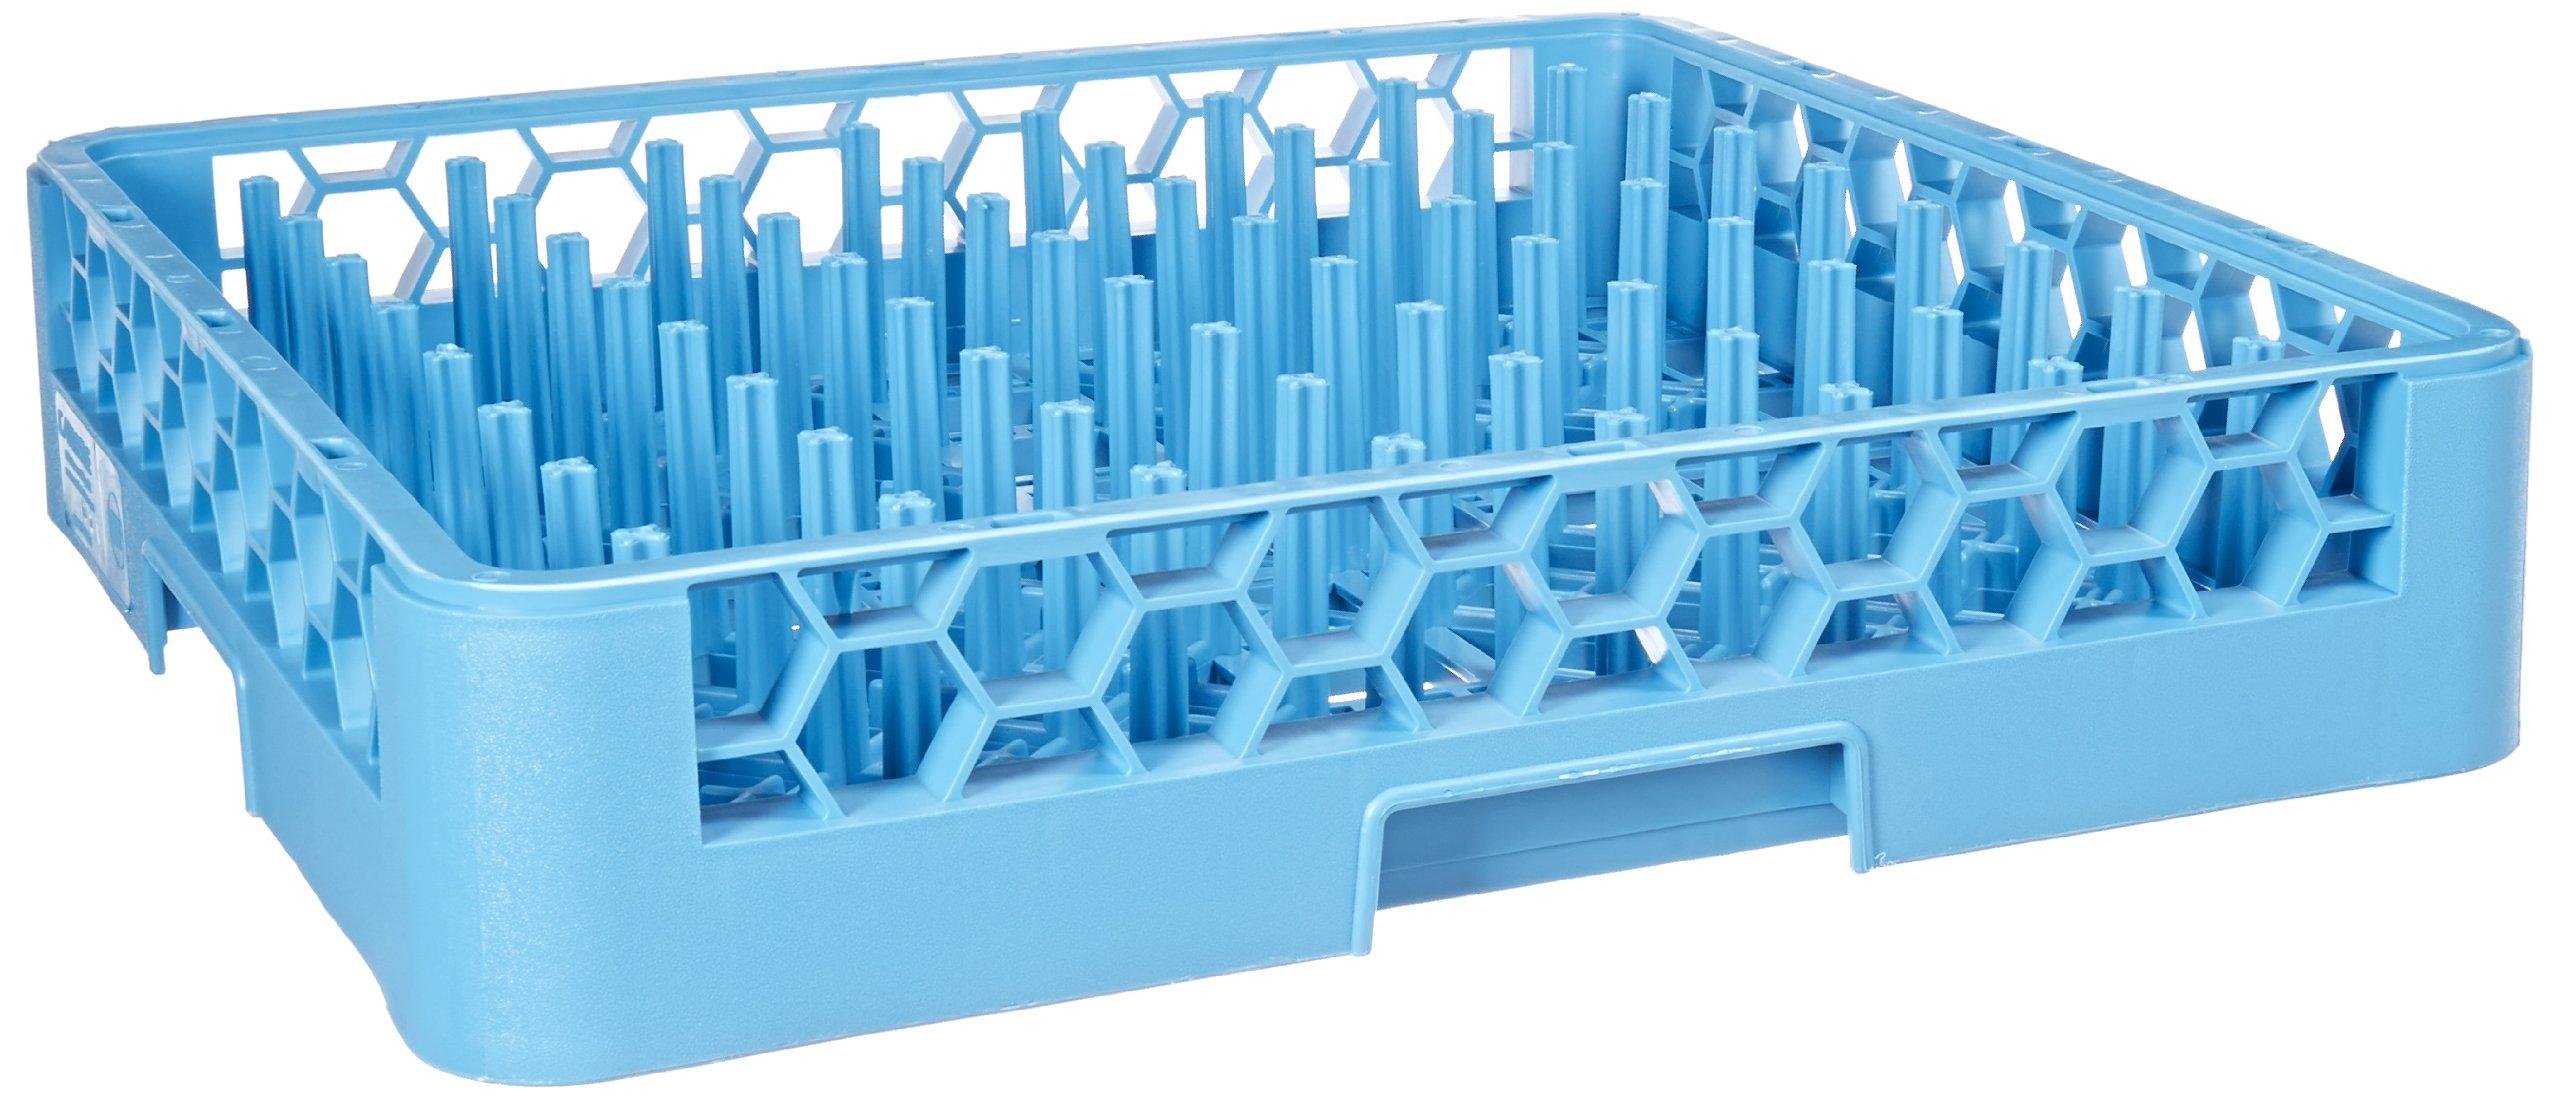 Carlisle RTP14 OptiClean Polypropylene Tall Peg Plate & Tray Rack, 19.75 x 19.75 x 4'', Carlisle Blue (Case of 6)